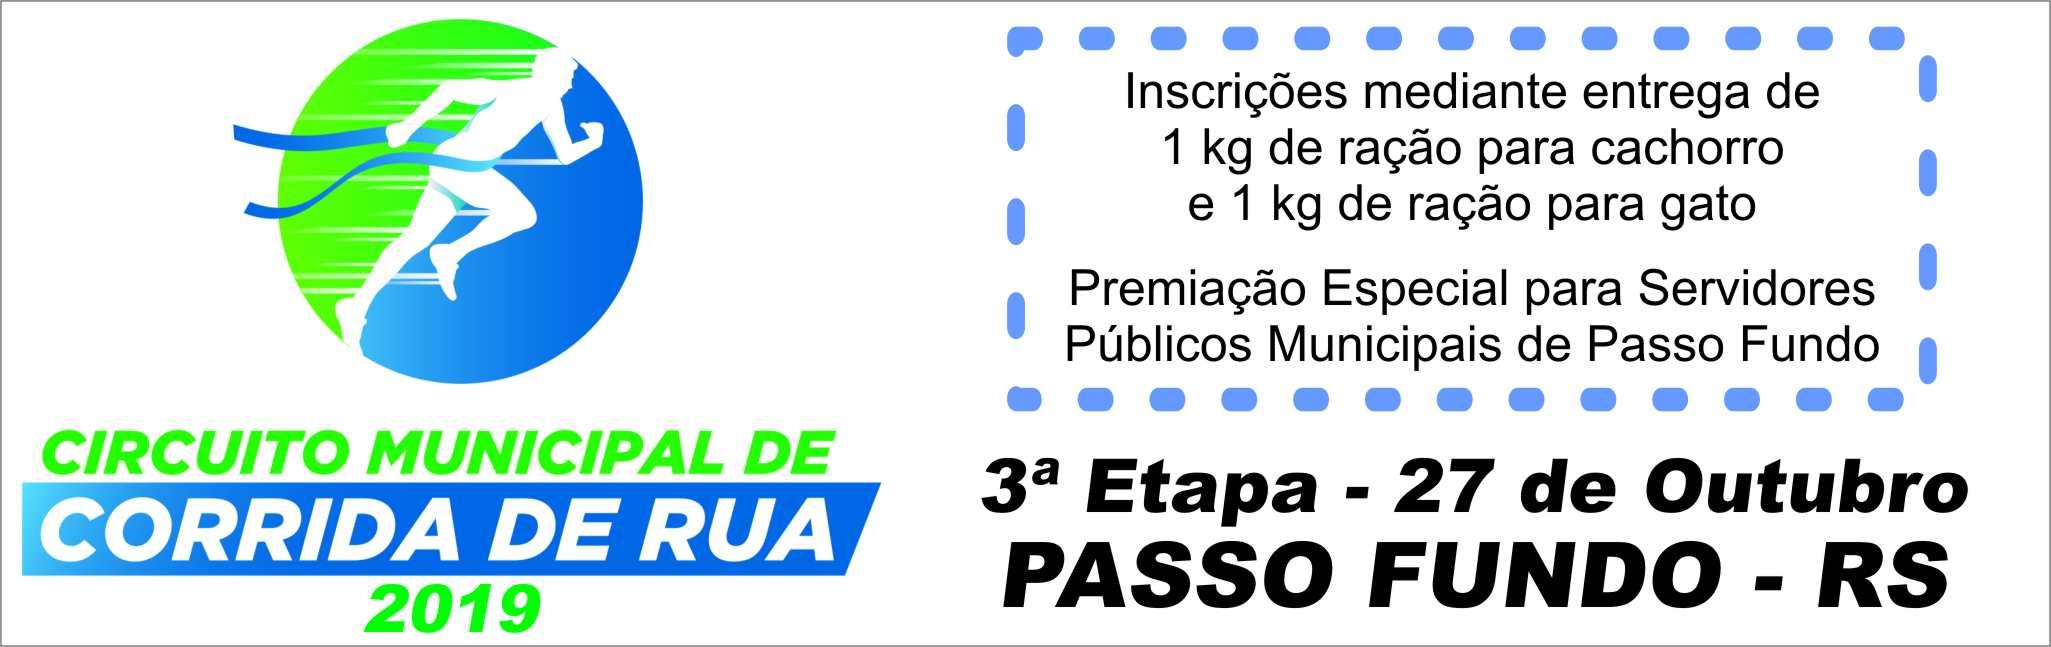 3ª Etapa Circuito Municipal de Corrida De Rua - Prefeitura de Passo Fundo - Rádio Uirapuru